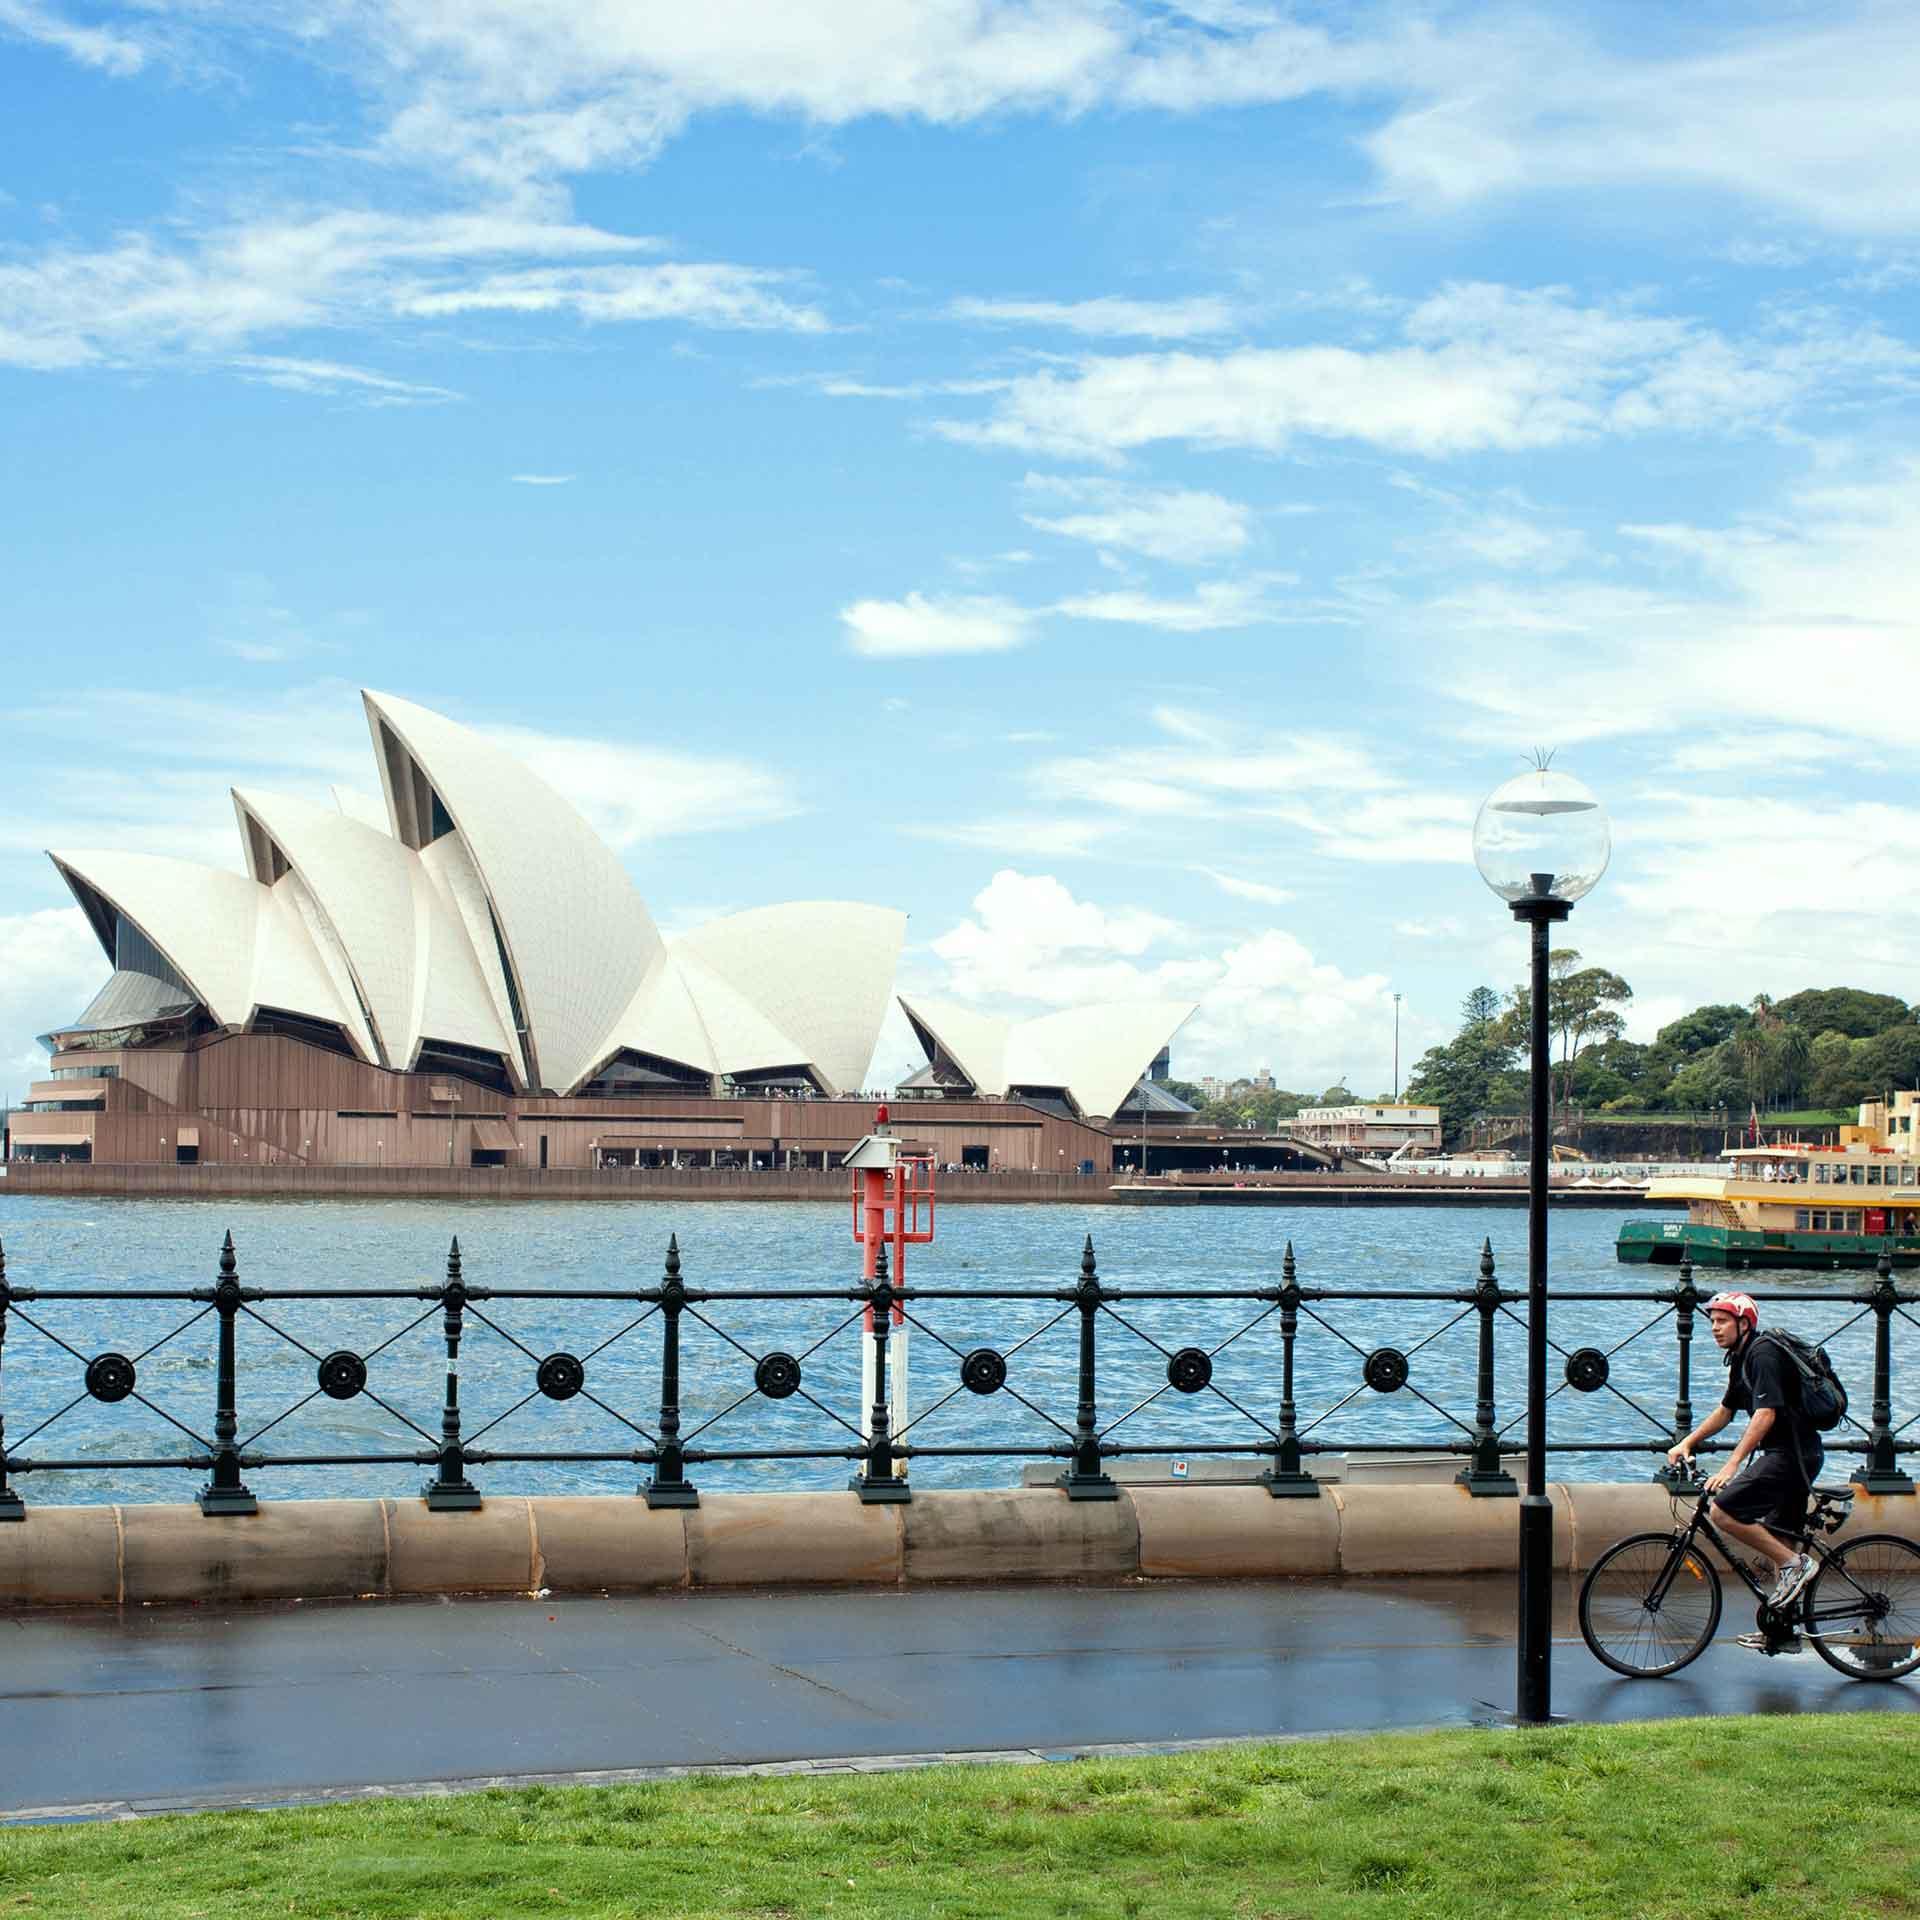 Velocità libero dating Sydney